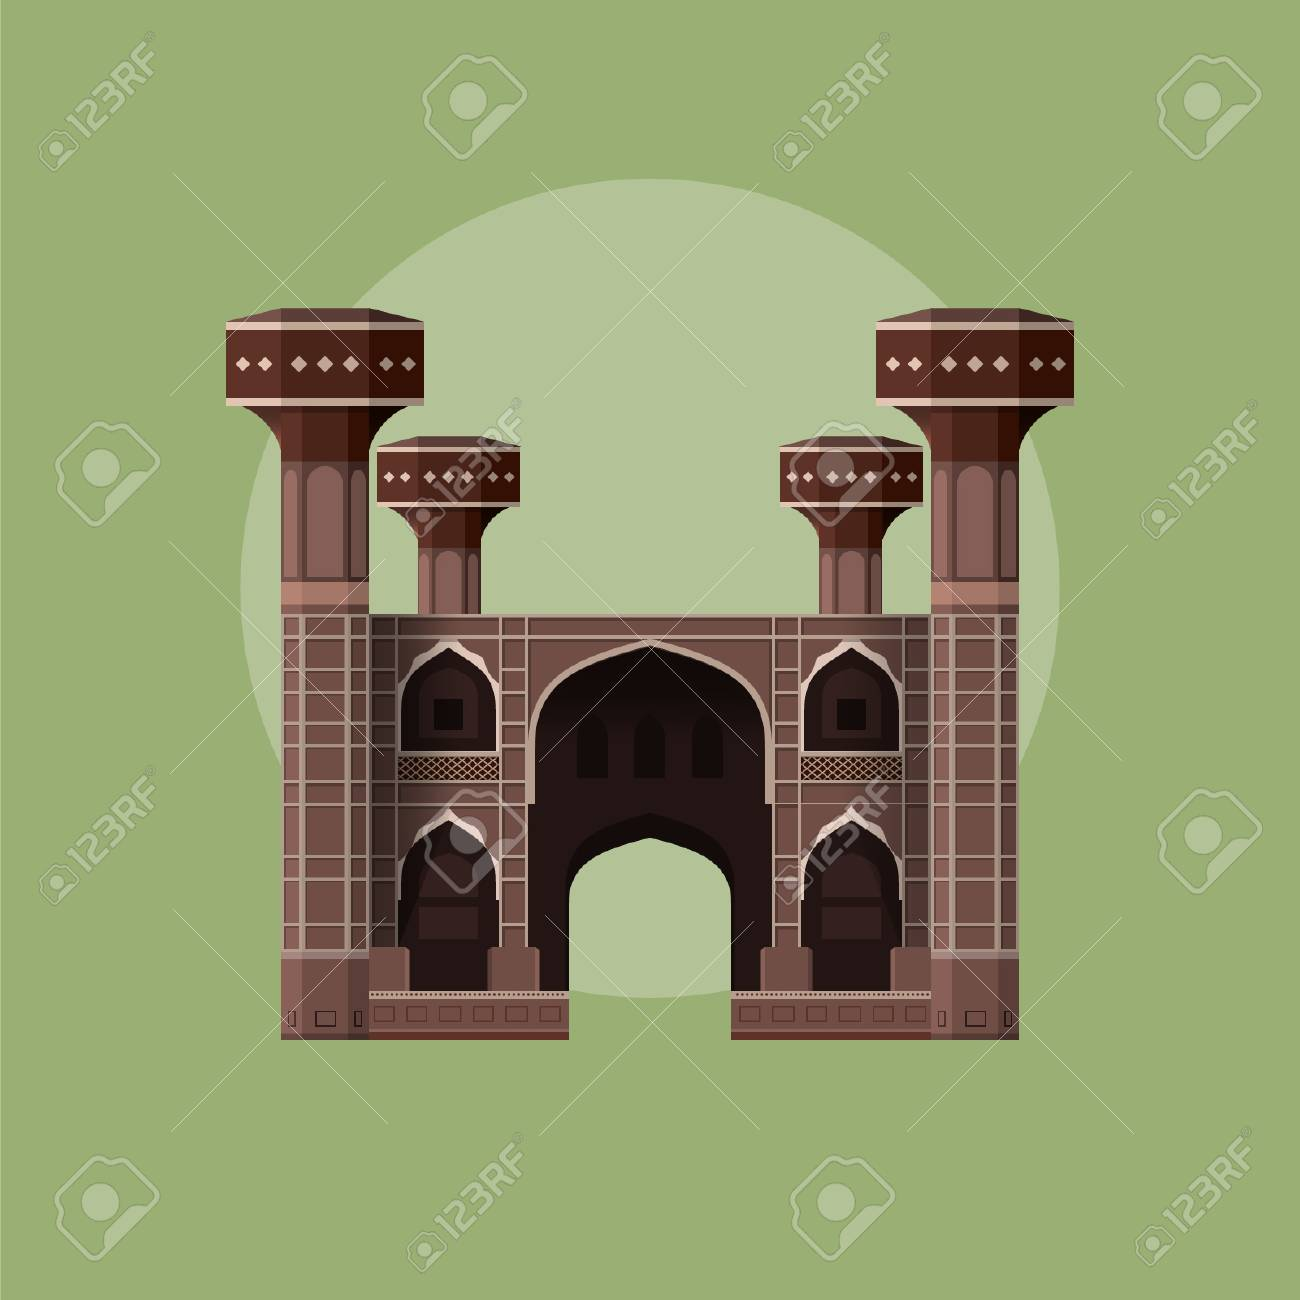 Chuburji - Landmark of Pakistan - 110619481